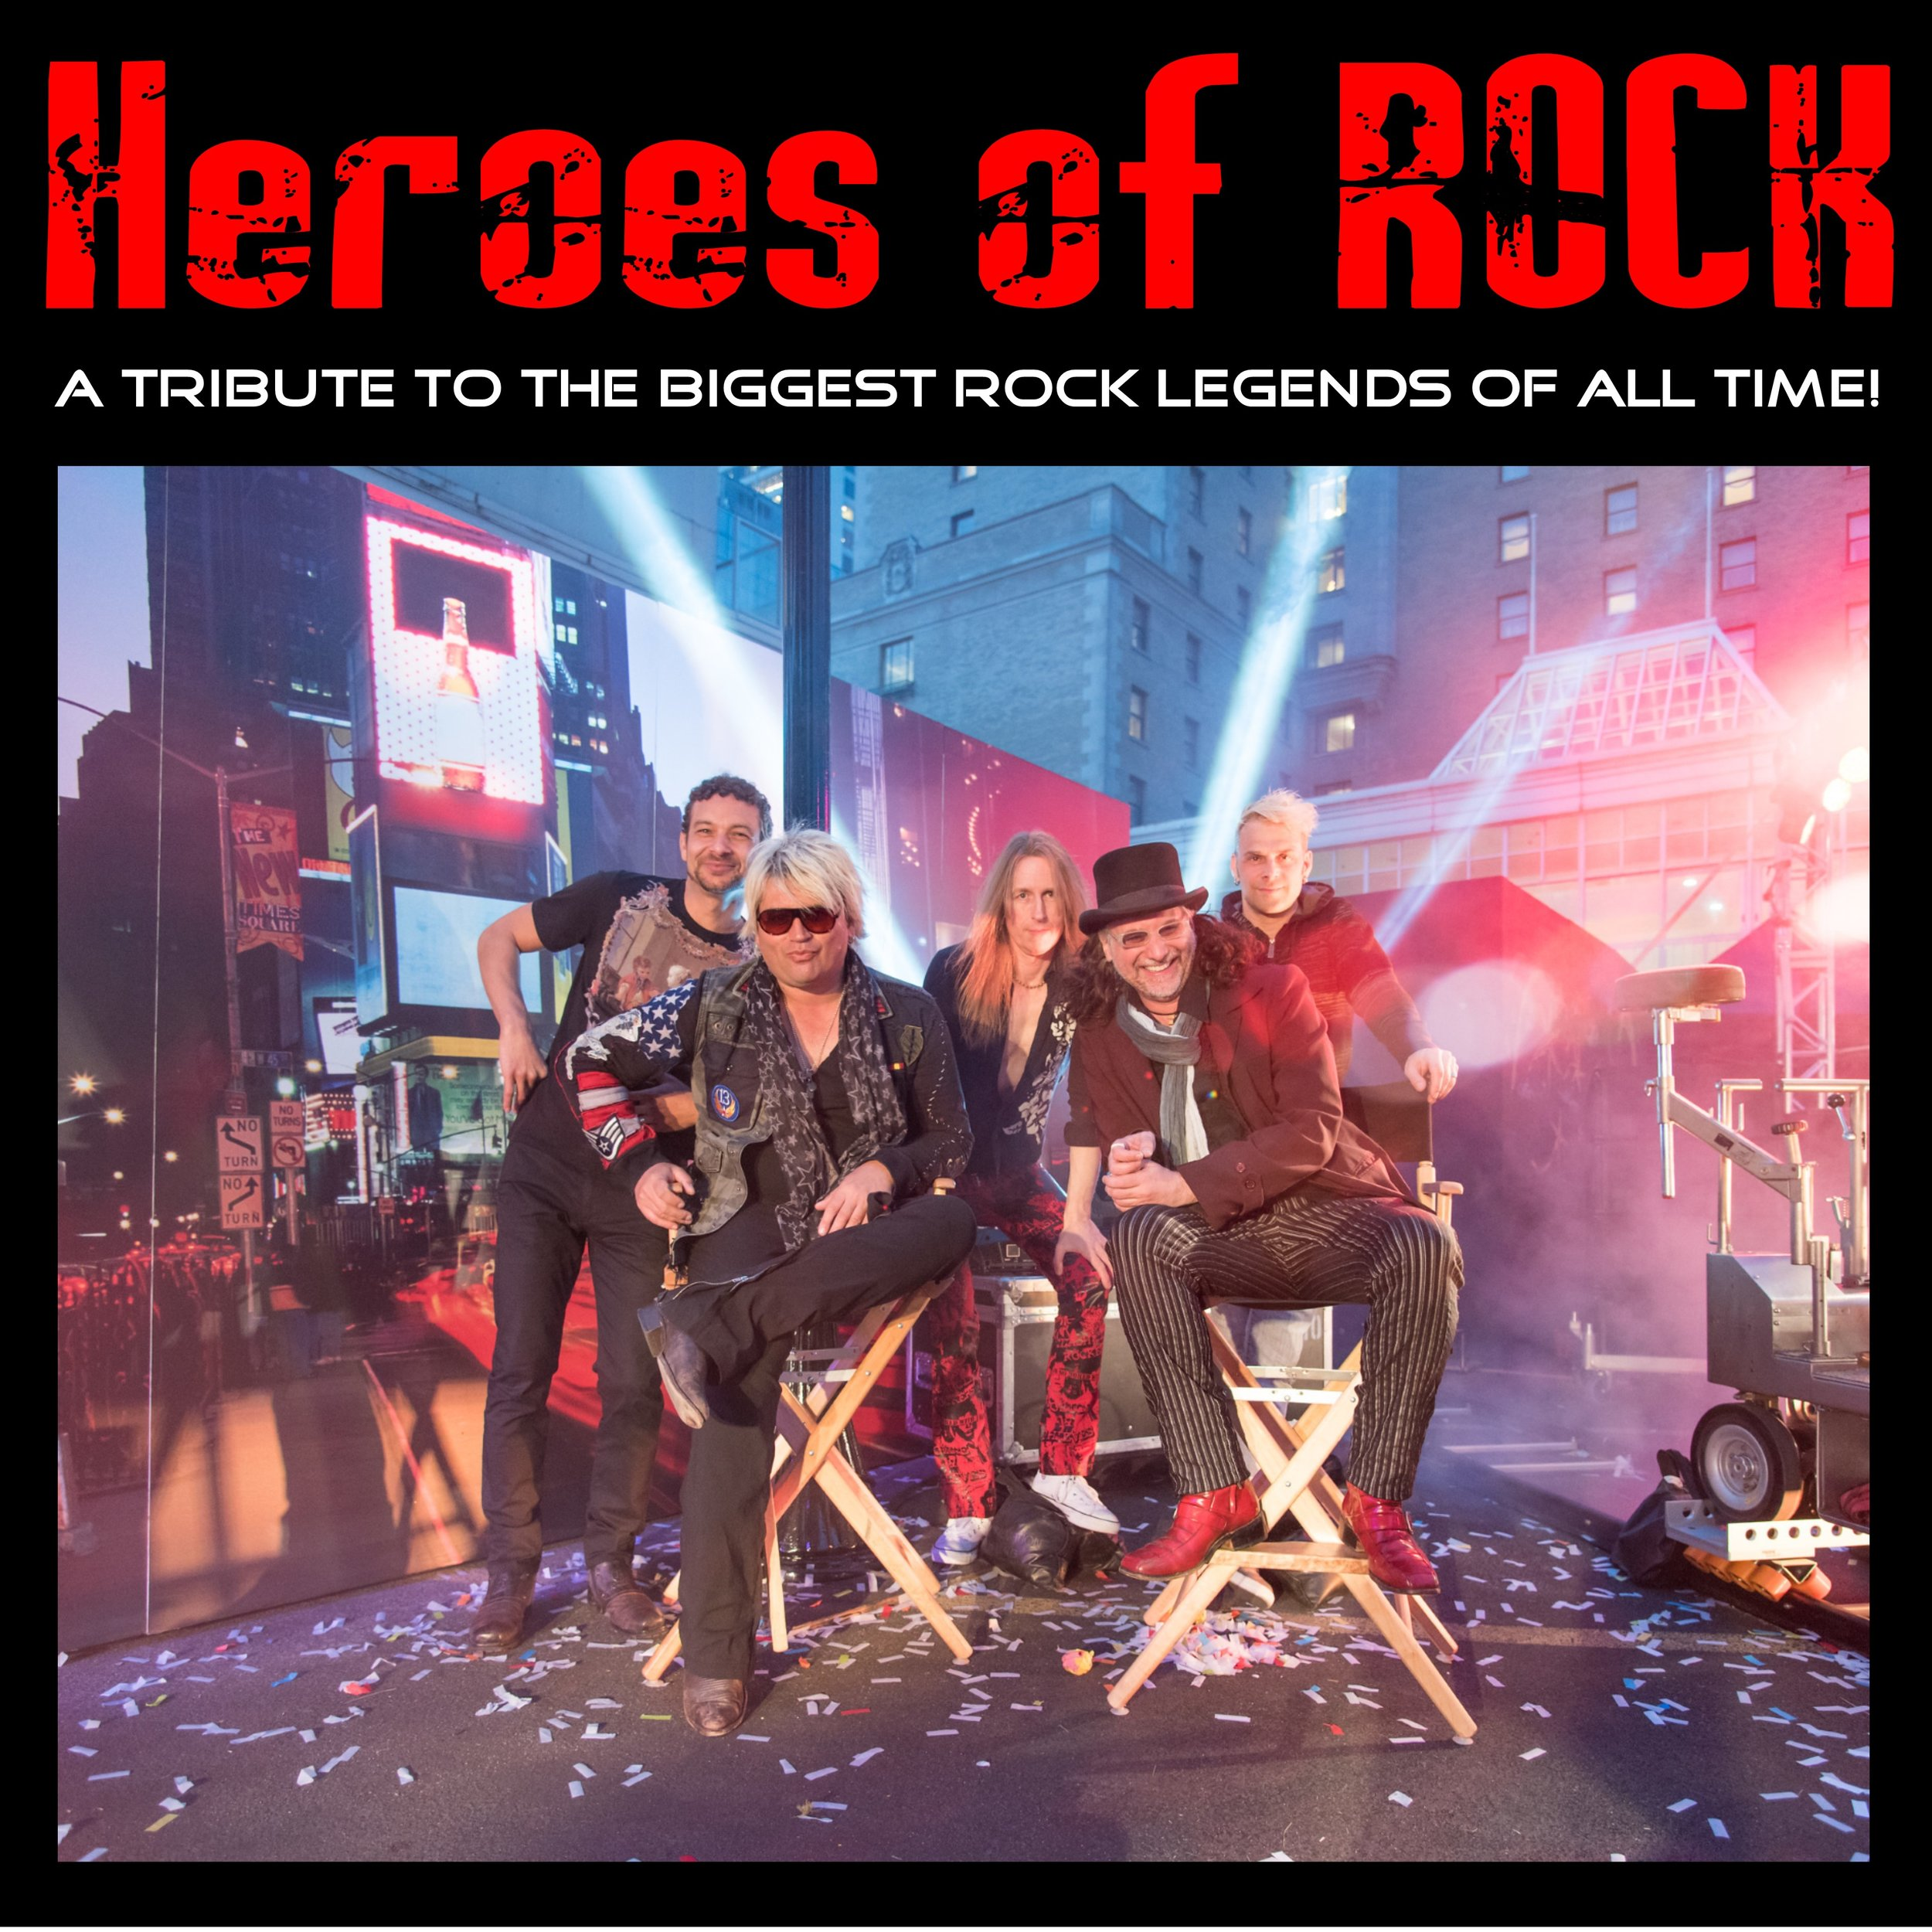 7:15 - 9:00Heroes of Rock/Jonas Falle -